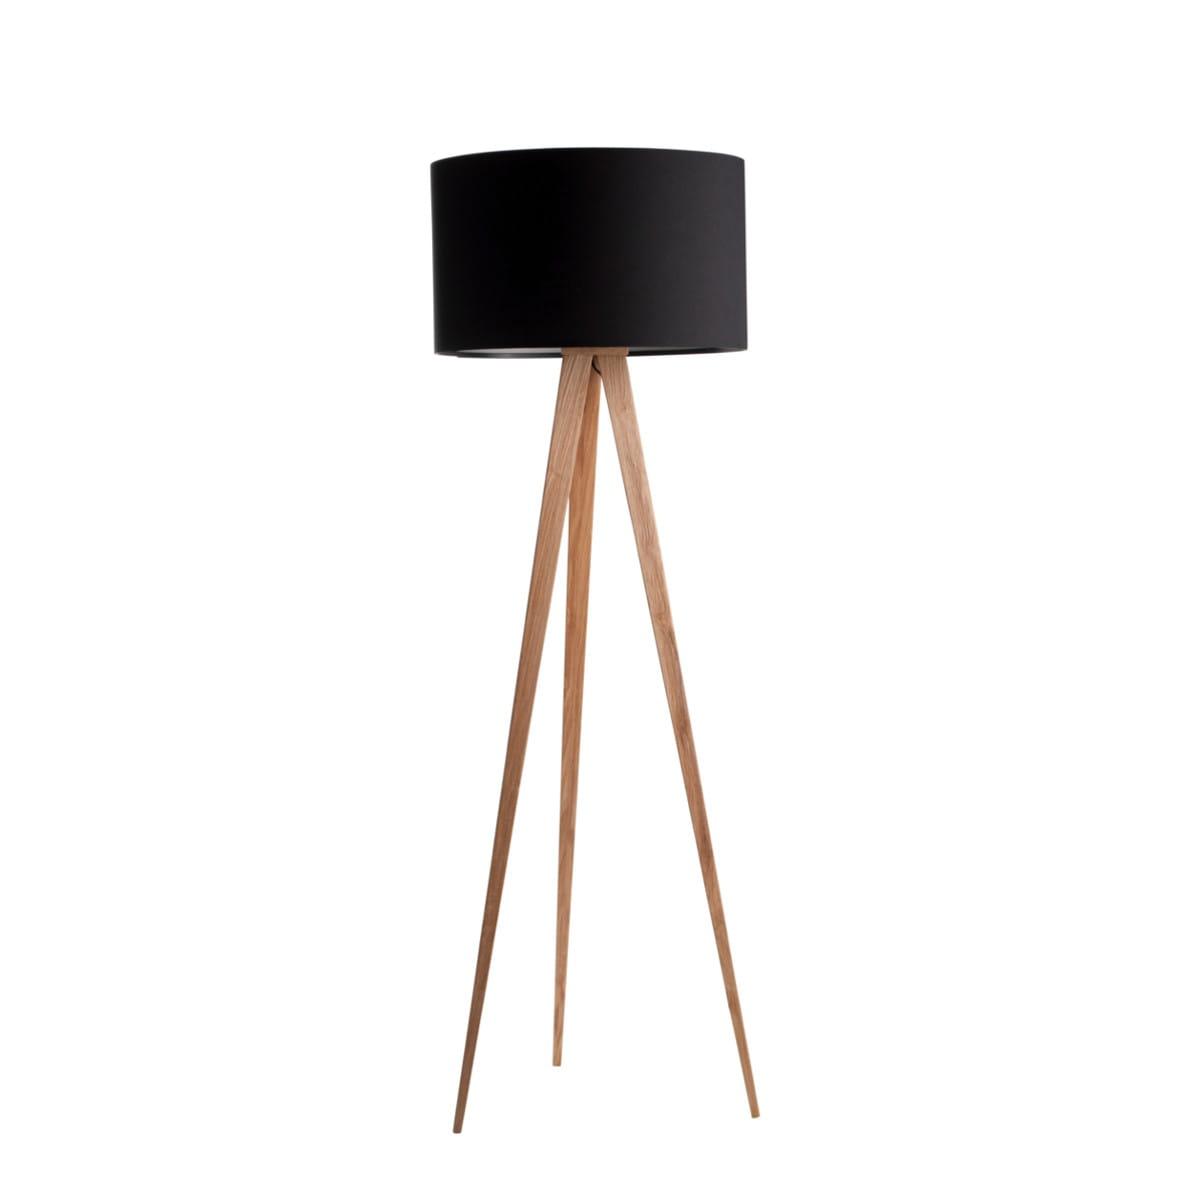 floor lamp tripod wood black zuiver nordic decoration home. Black Bedroom Furniture Sets. Home Design Ideas